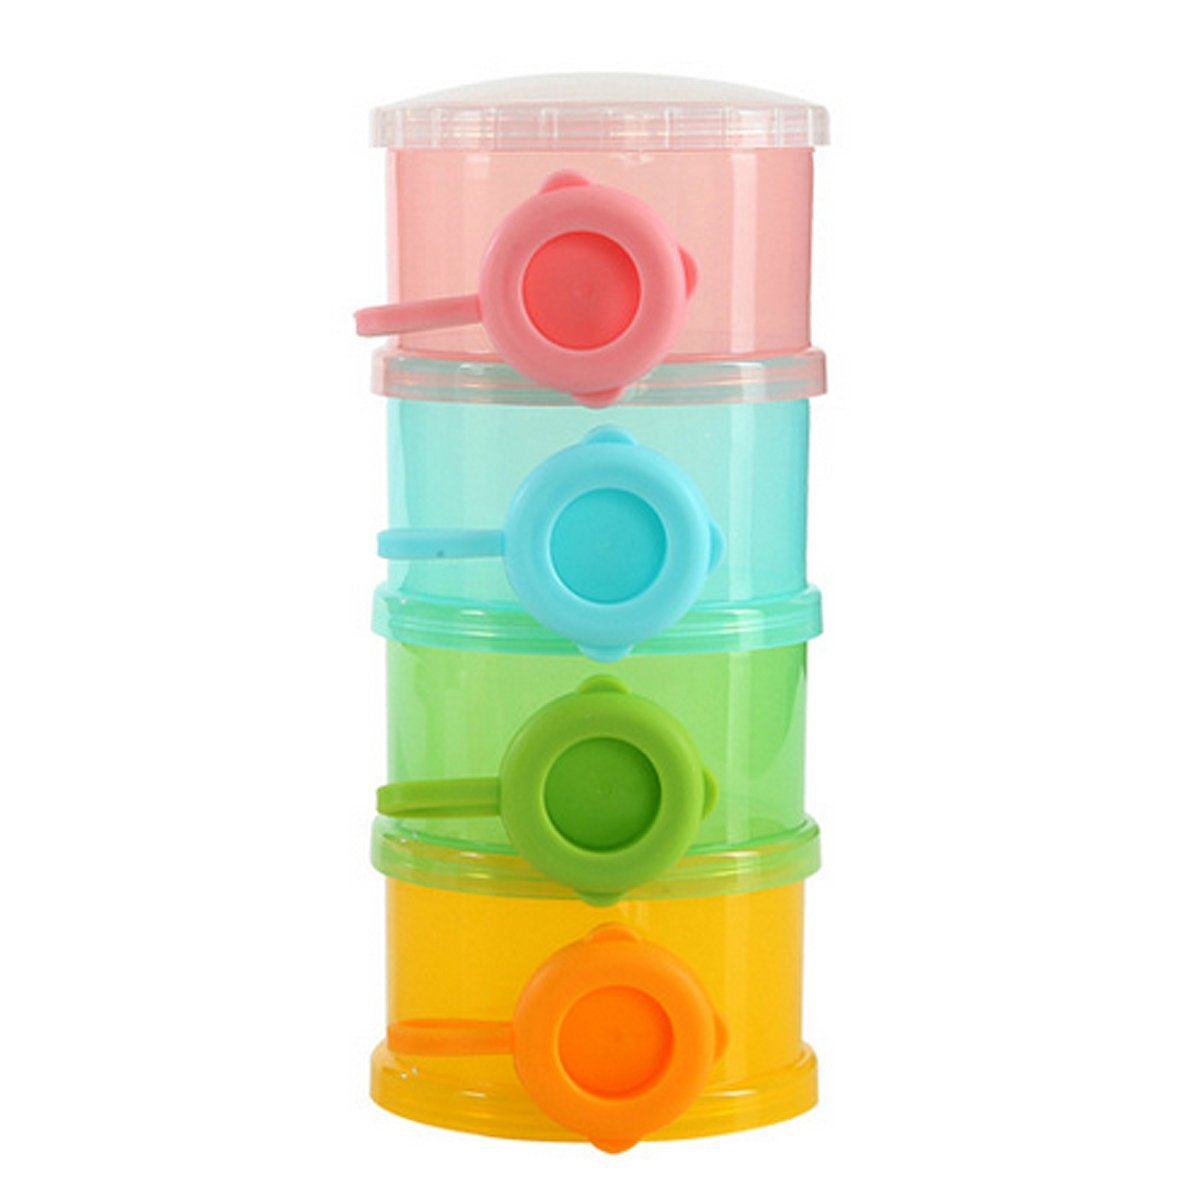 Mily Stackable Milk Powder Dispenser Formula Dispenser Snack Container (Multicolor)